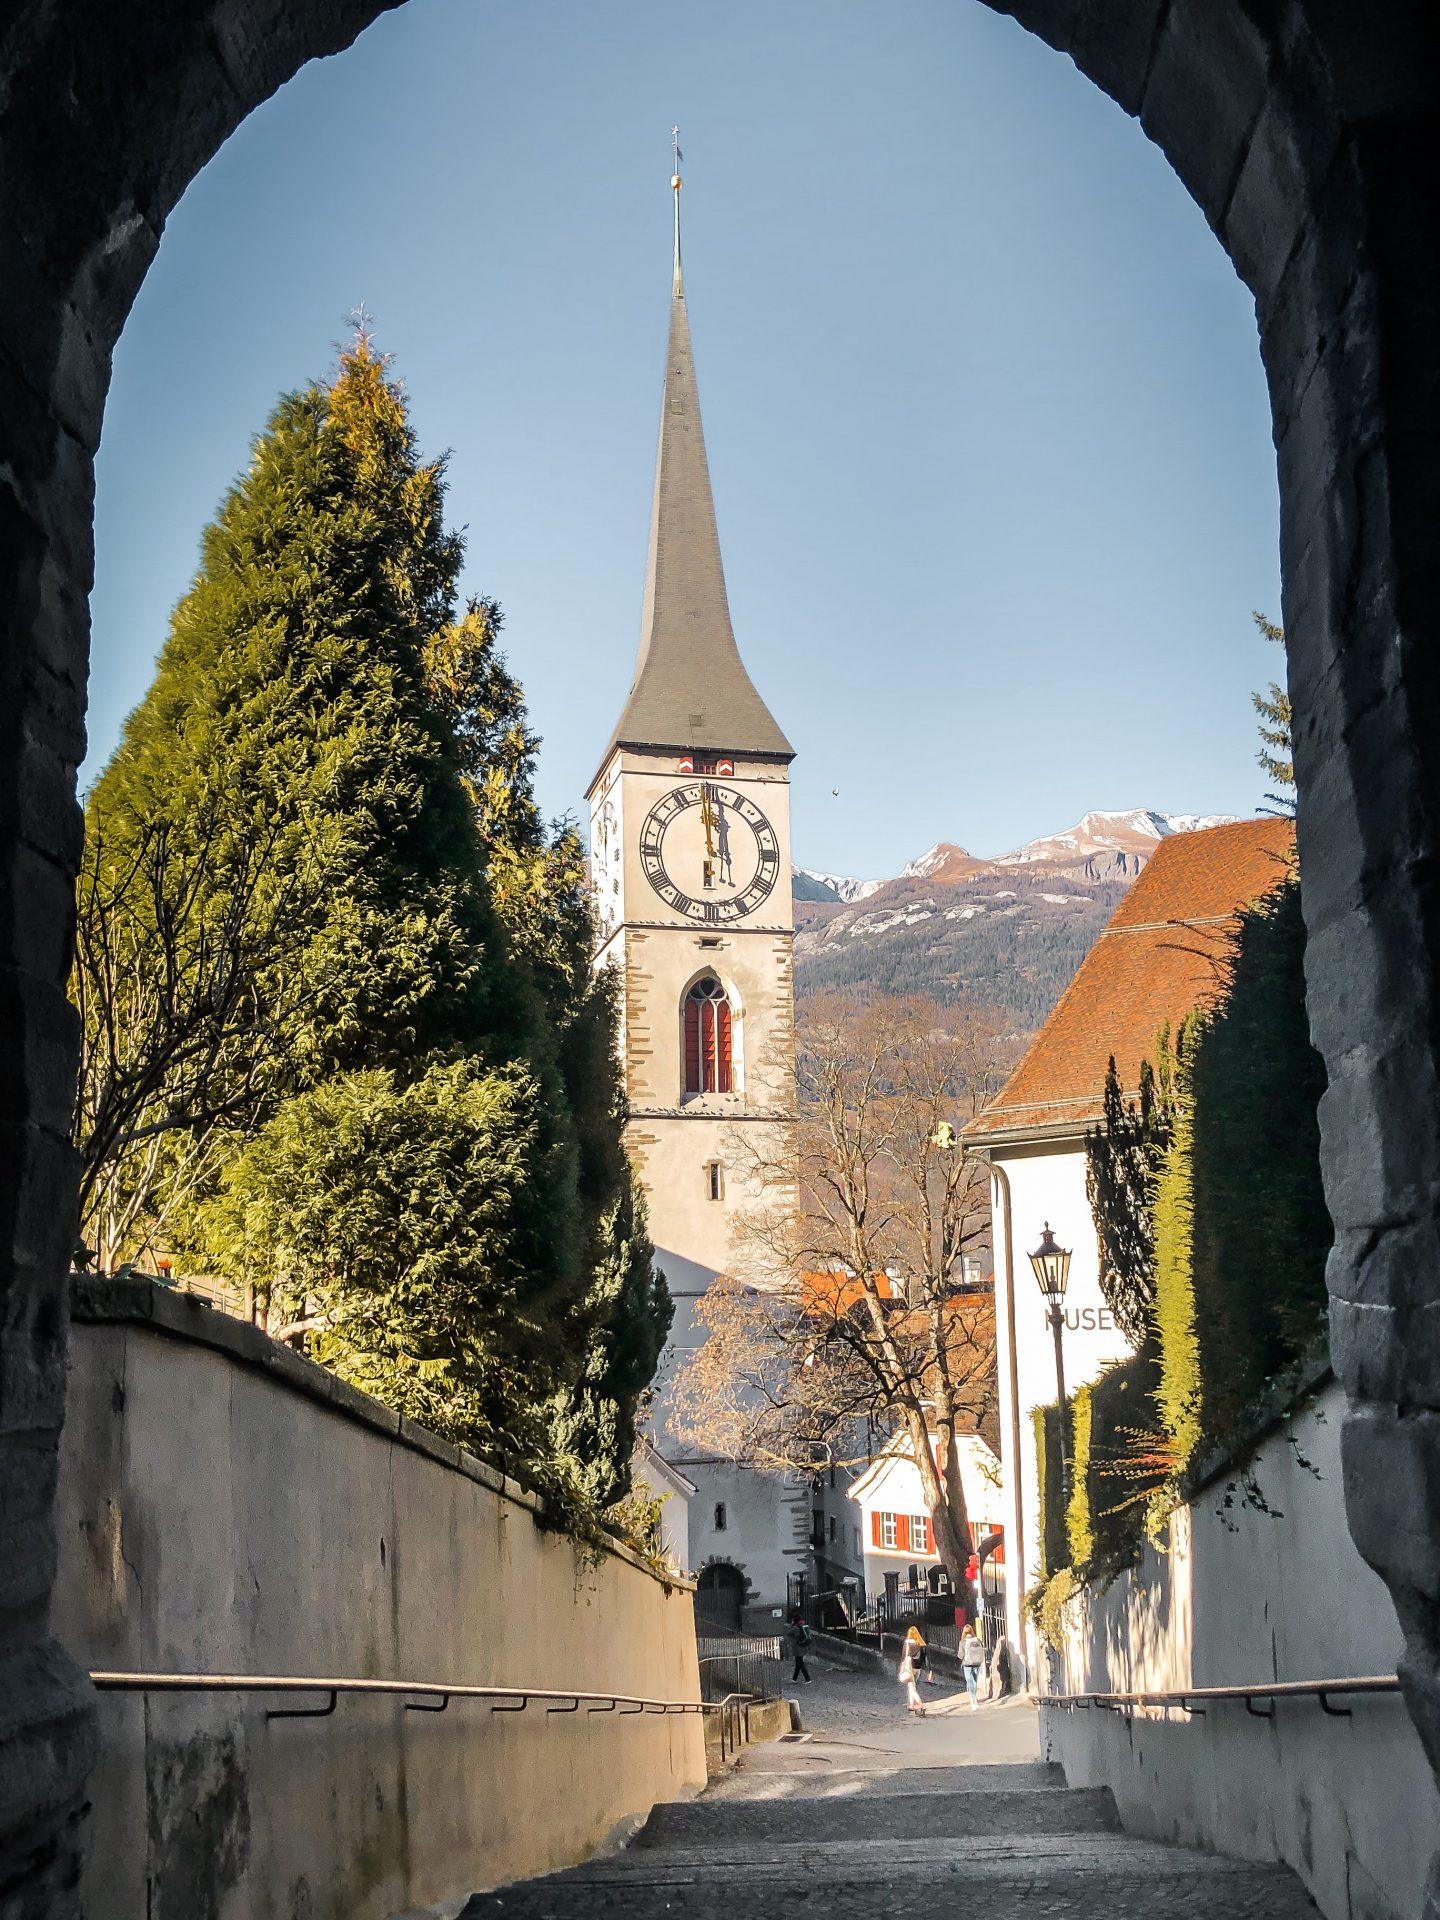 Coire Chur Lower Engadine Switzerland